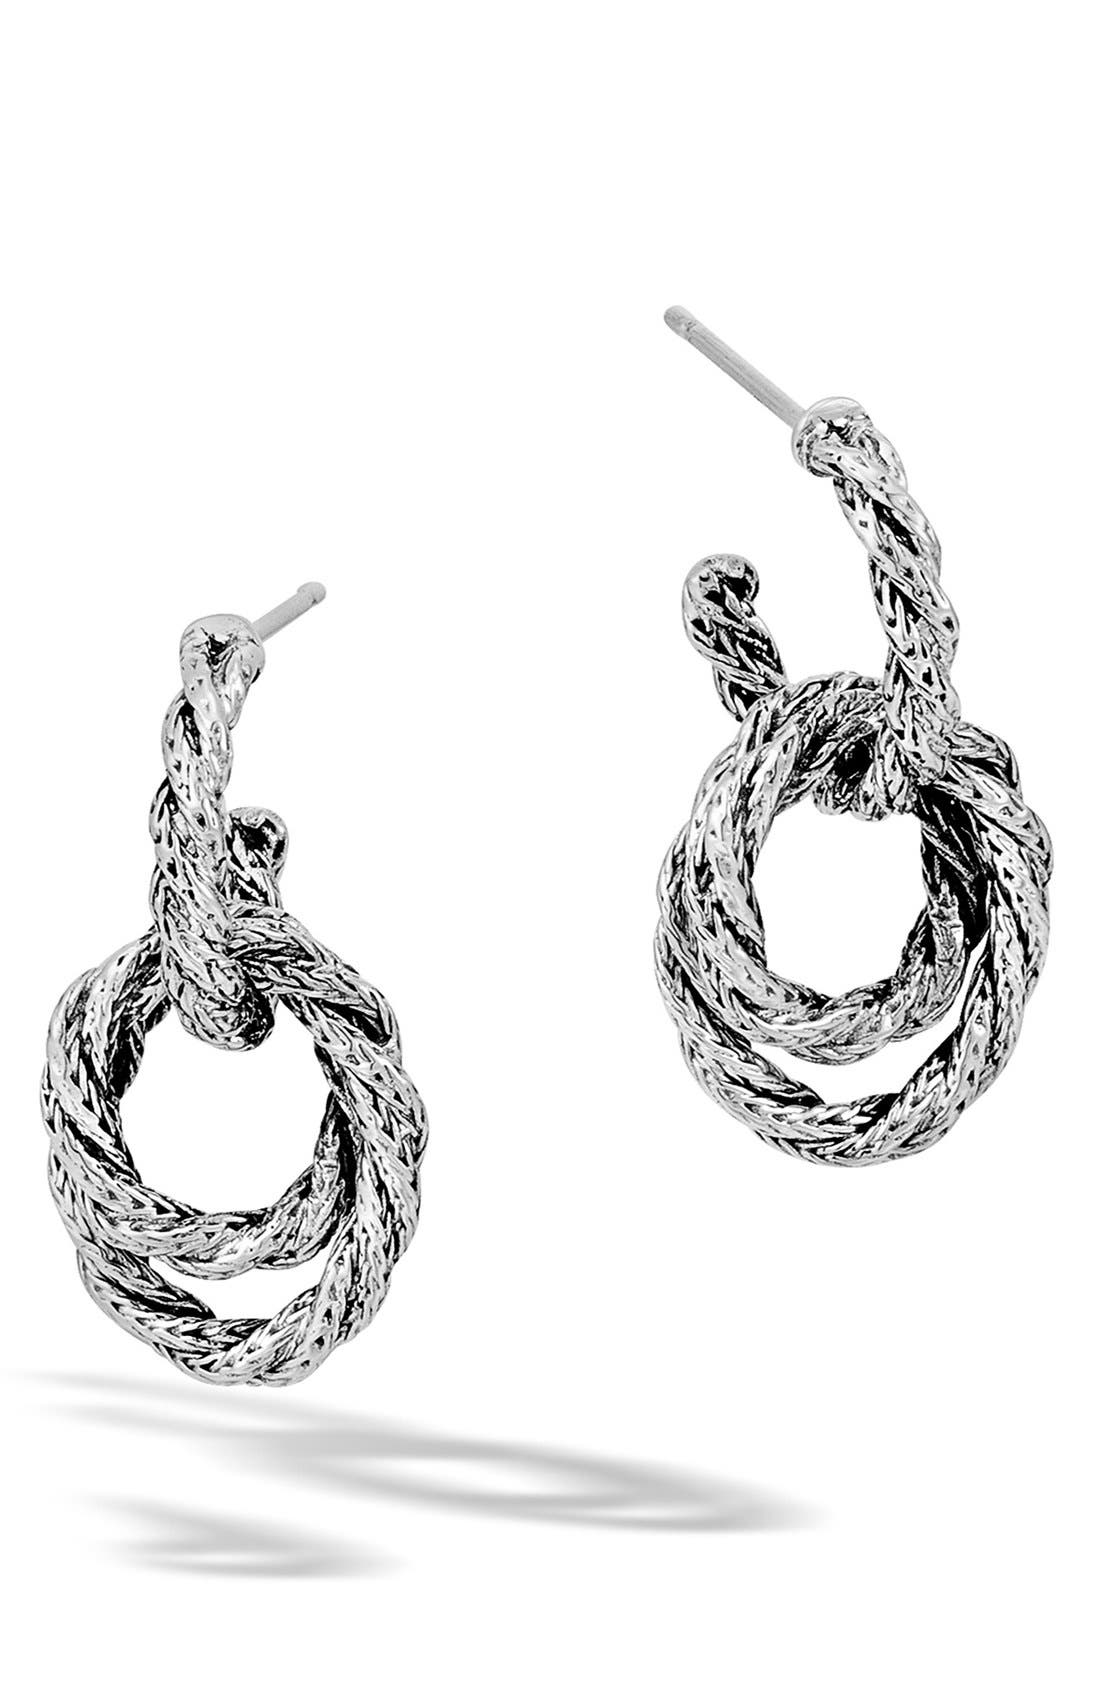 Main Image - John Hardy 'Classic Chain' Double Twisted Hoop Earrings